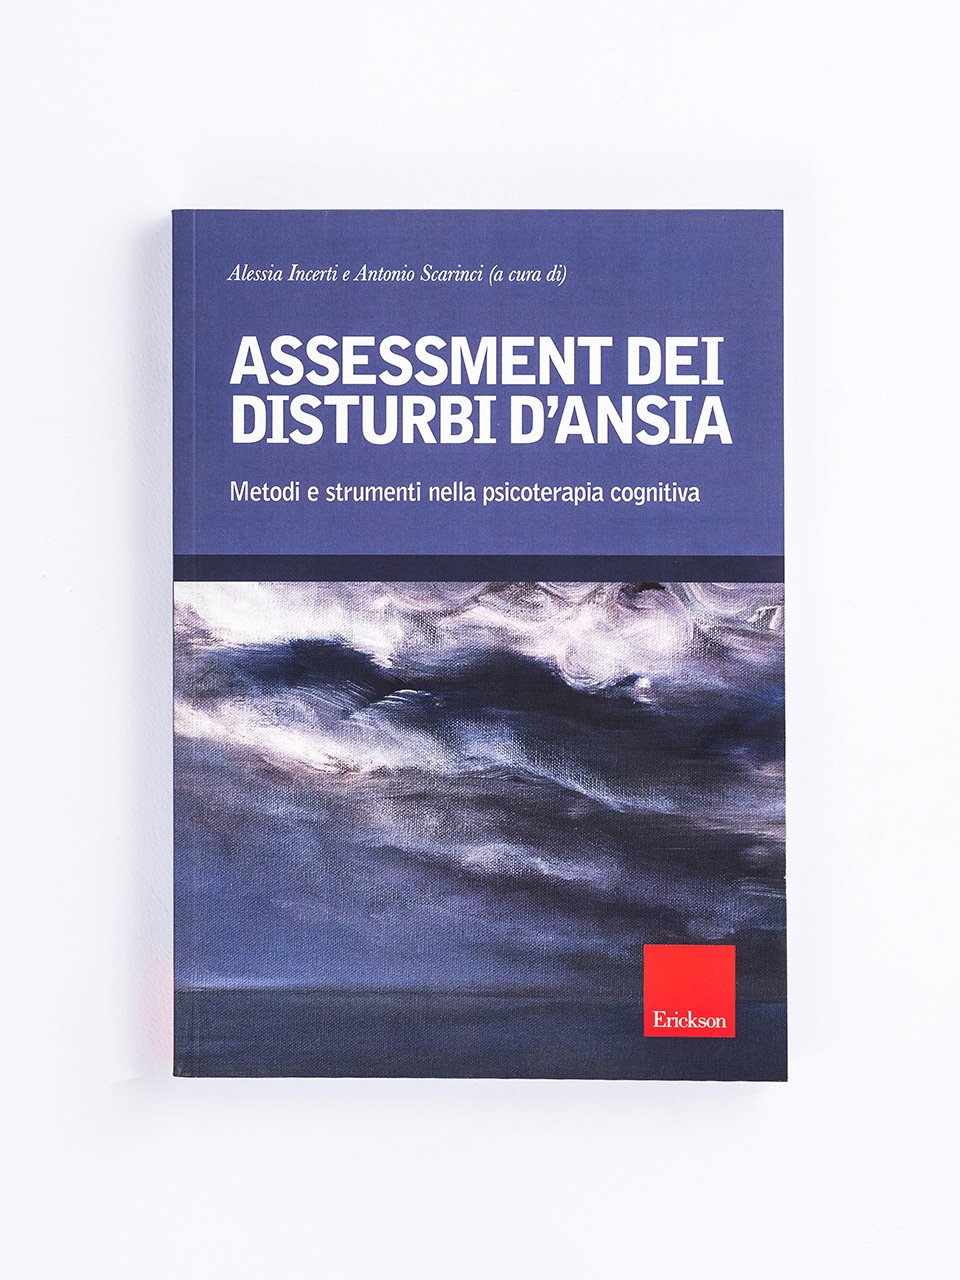 Assessment dei disturbi d'ansia - Stop all'ansia sociale - Libri - Erickson